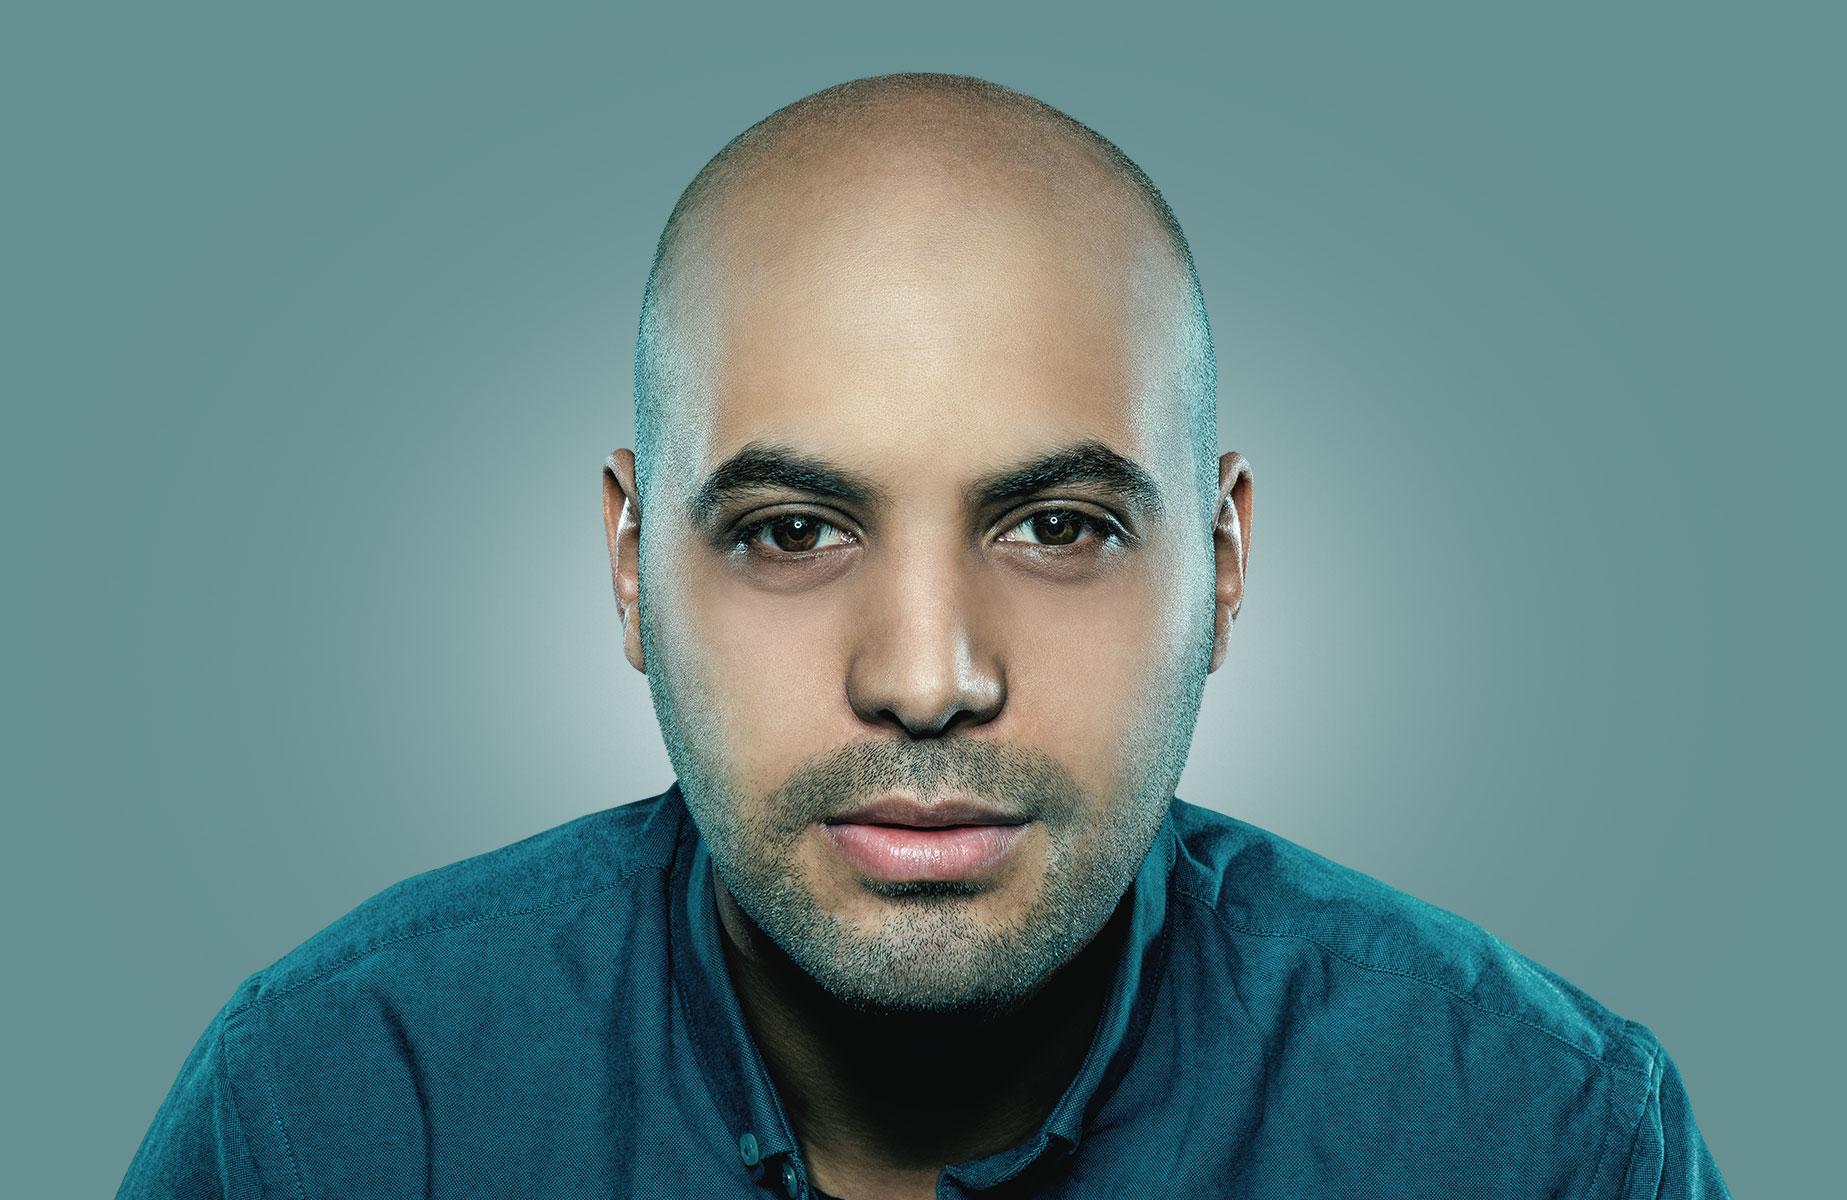 Mohamed Jihed Khikhia